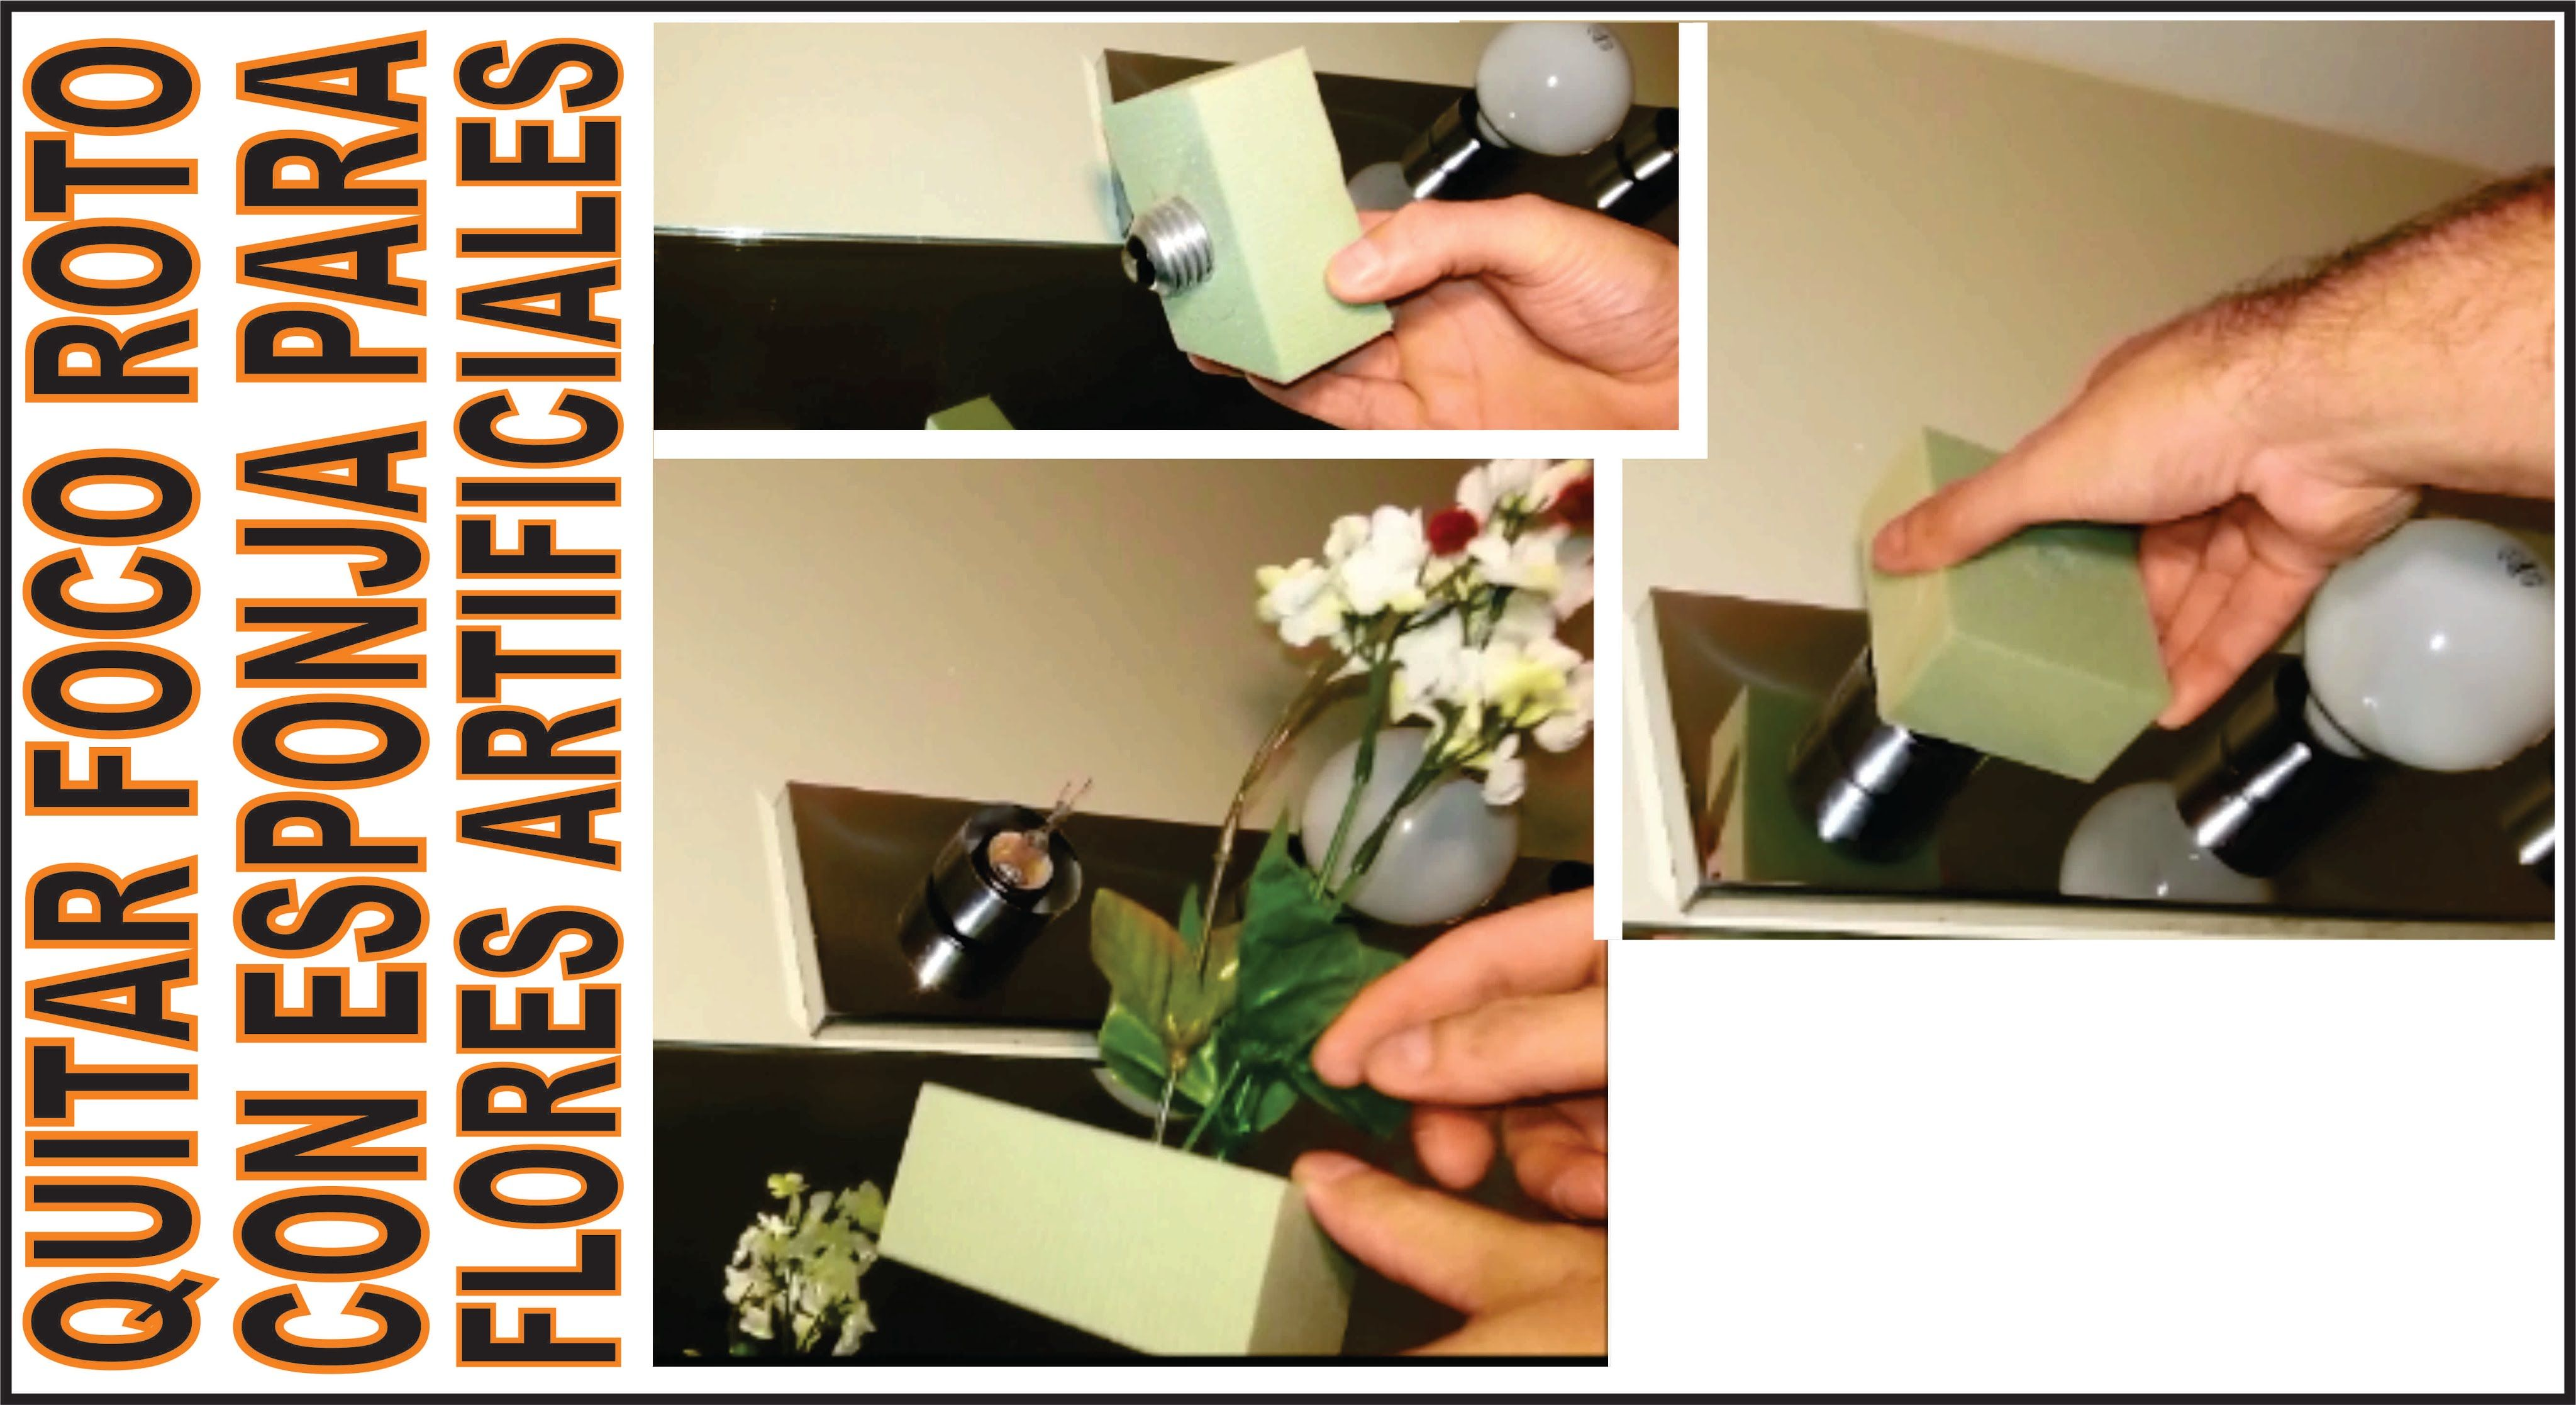 Como Quitar Foco Con Bombilla Rota Espuma Floral Bombillas Como Quitar